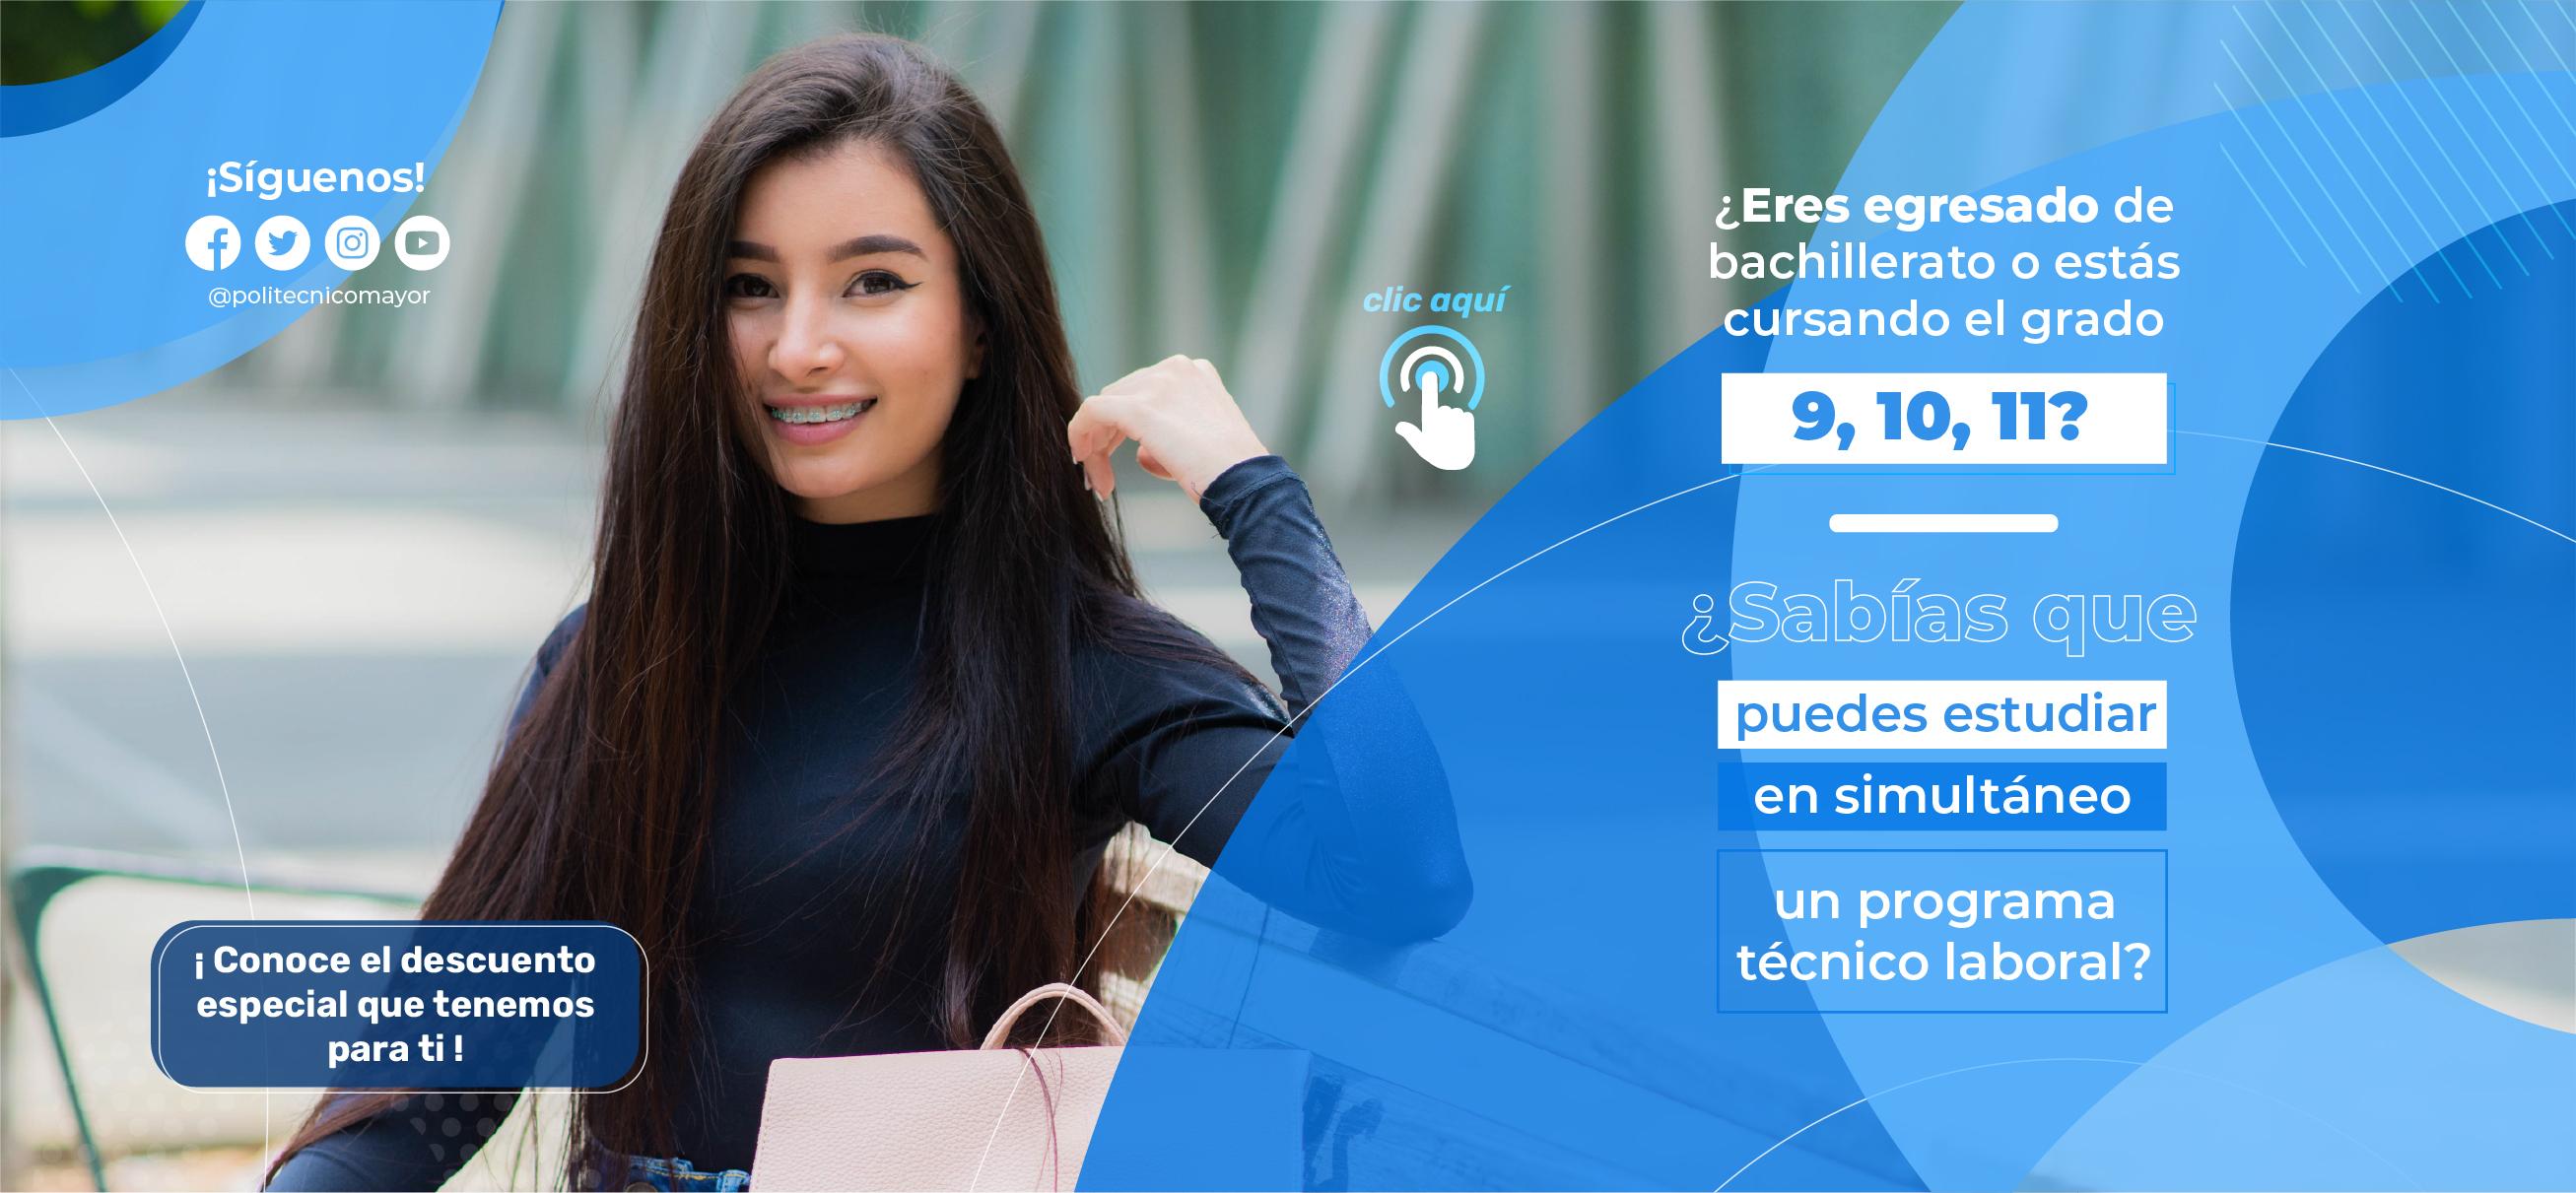 Programas_Tcnicos_Bachillerato_2021